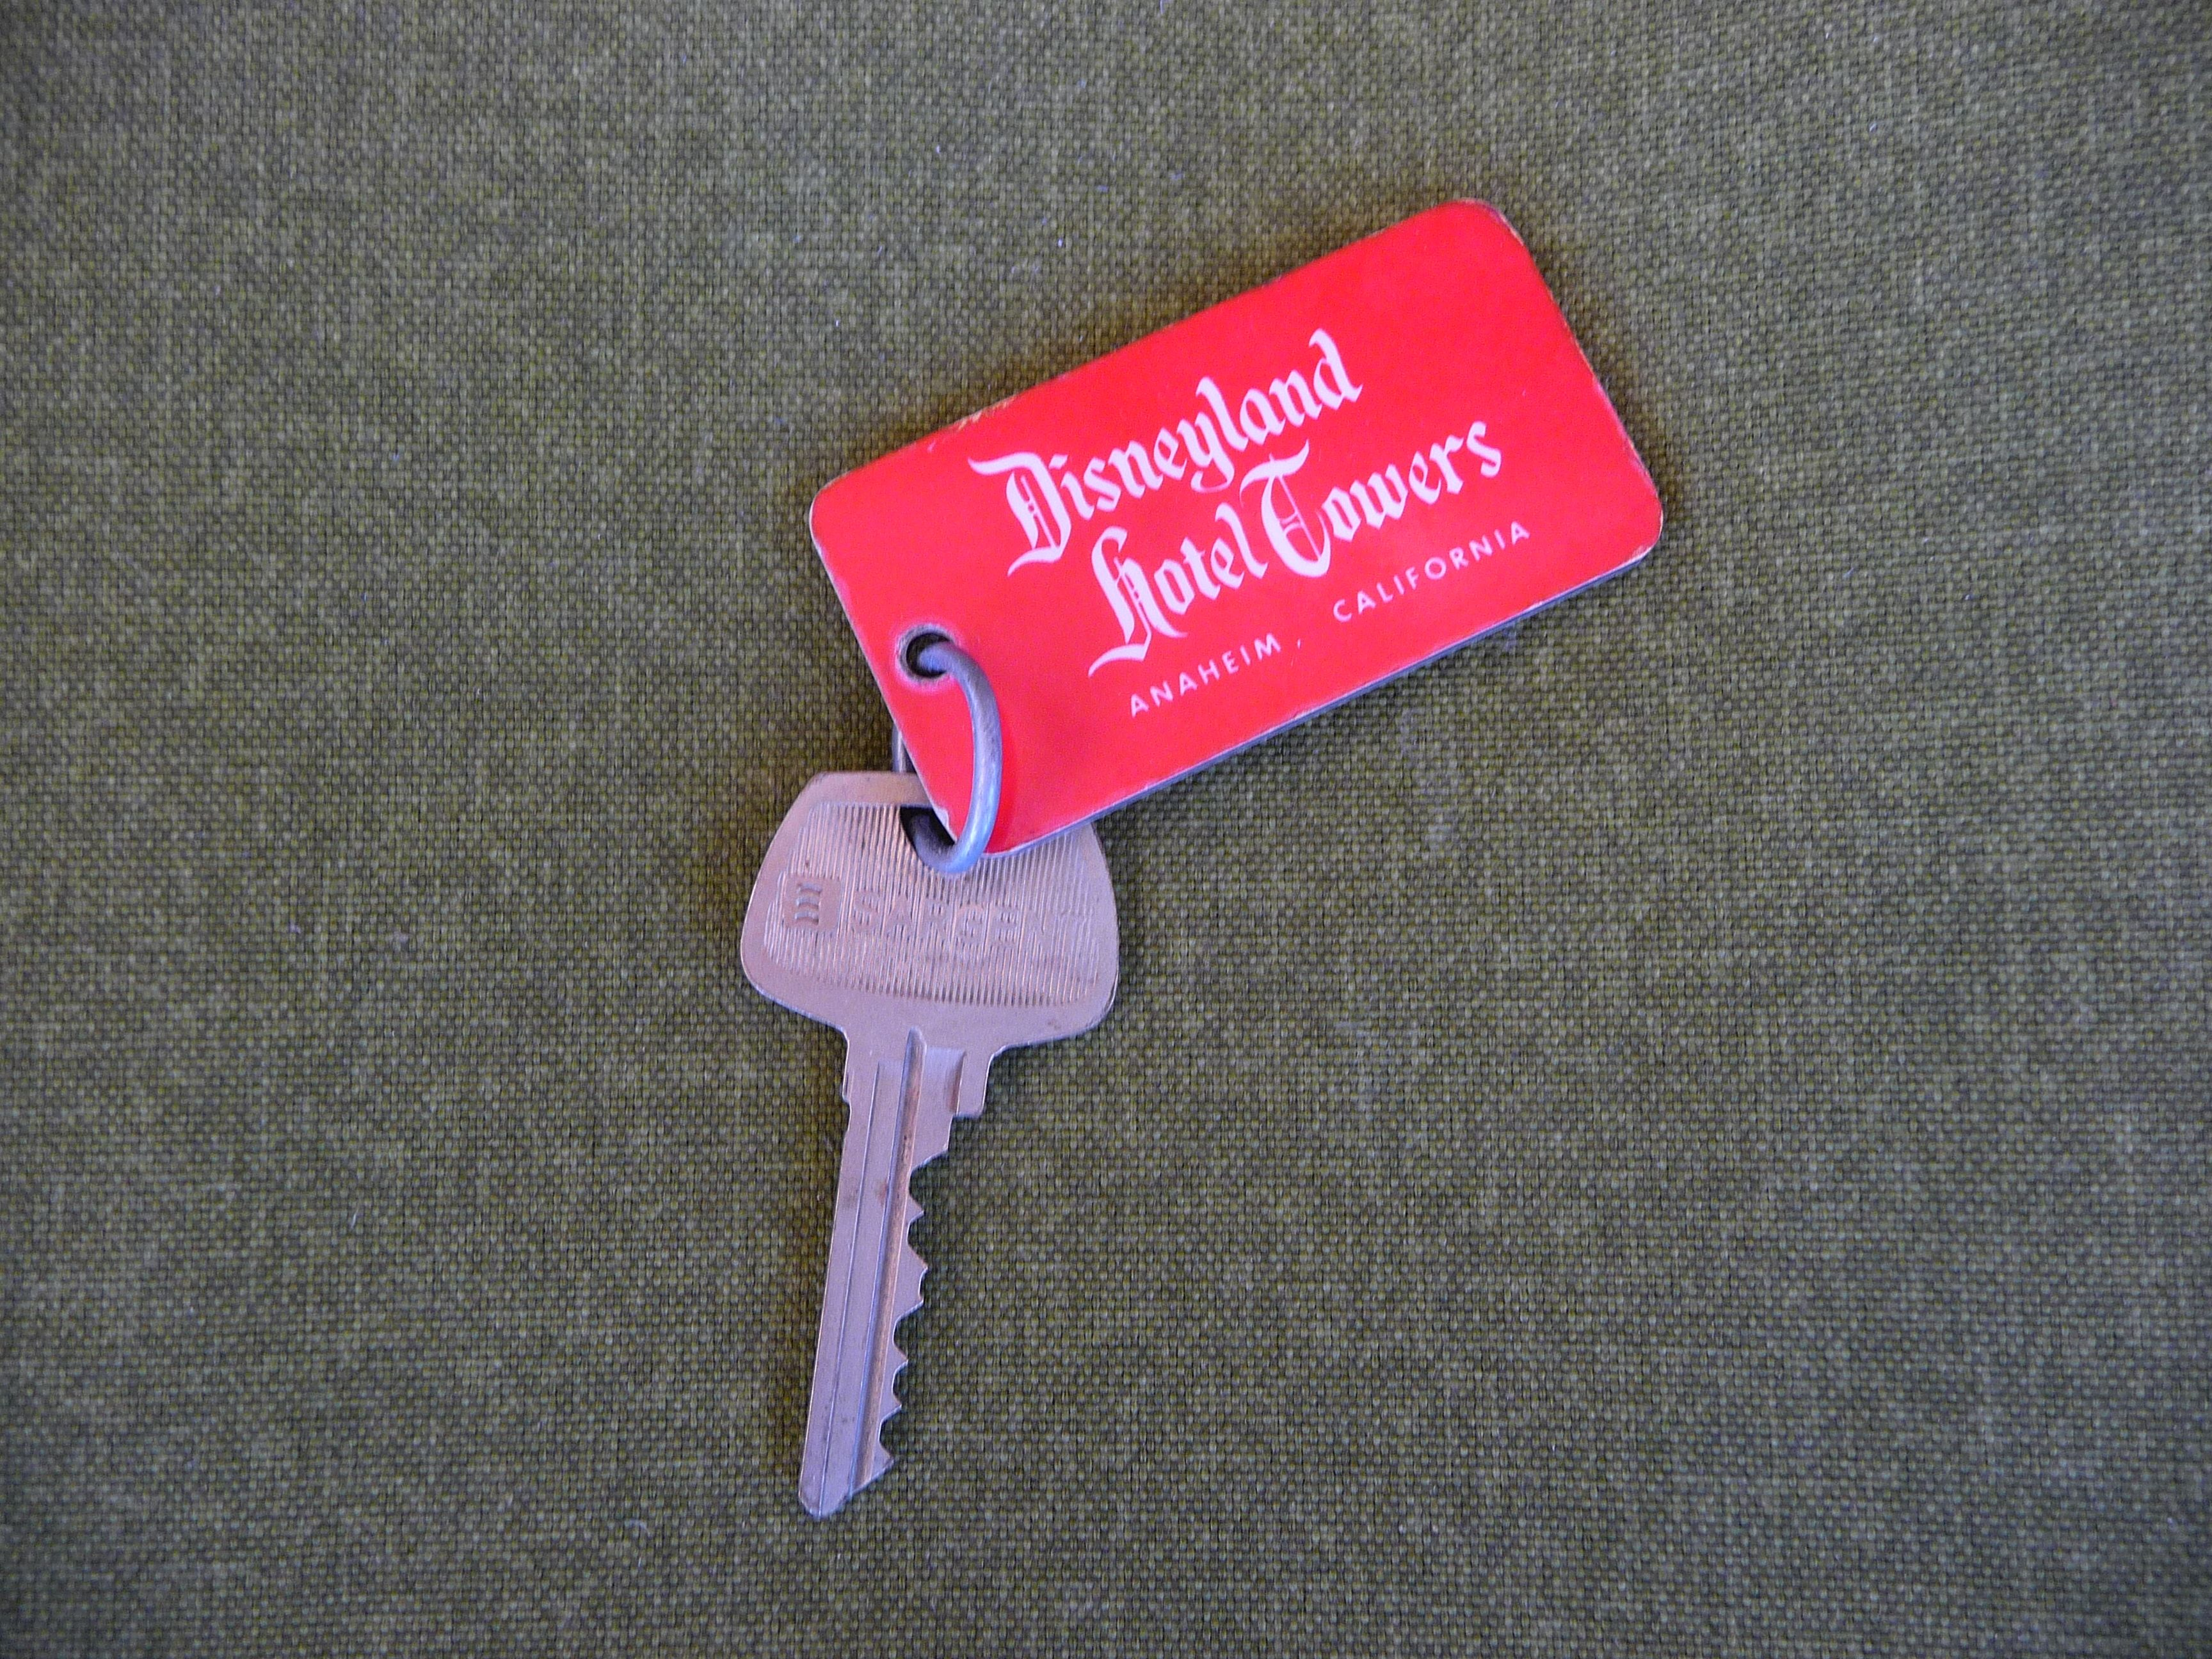 Disneyland hotel key disneyland hotel disneyland